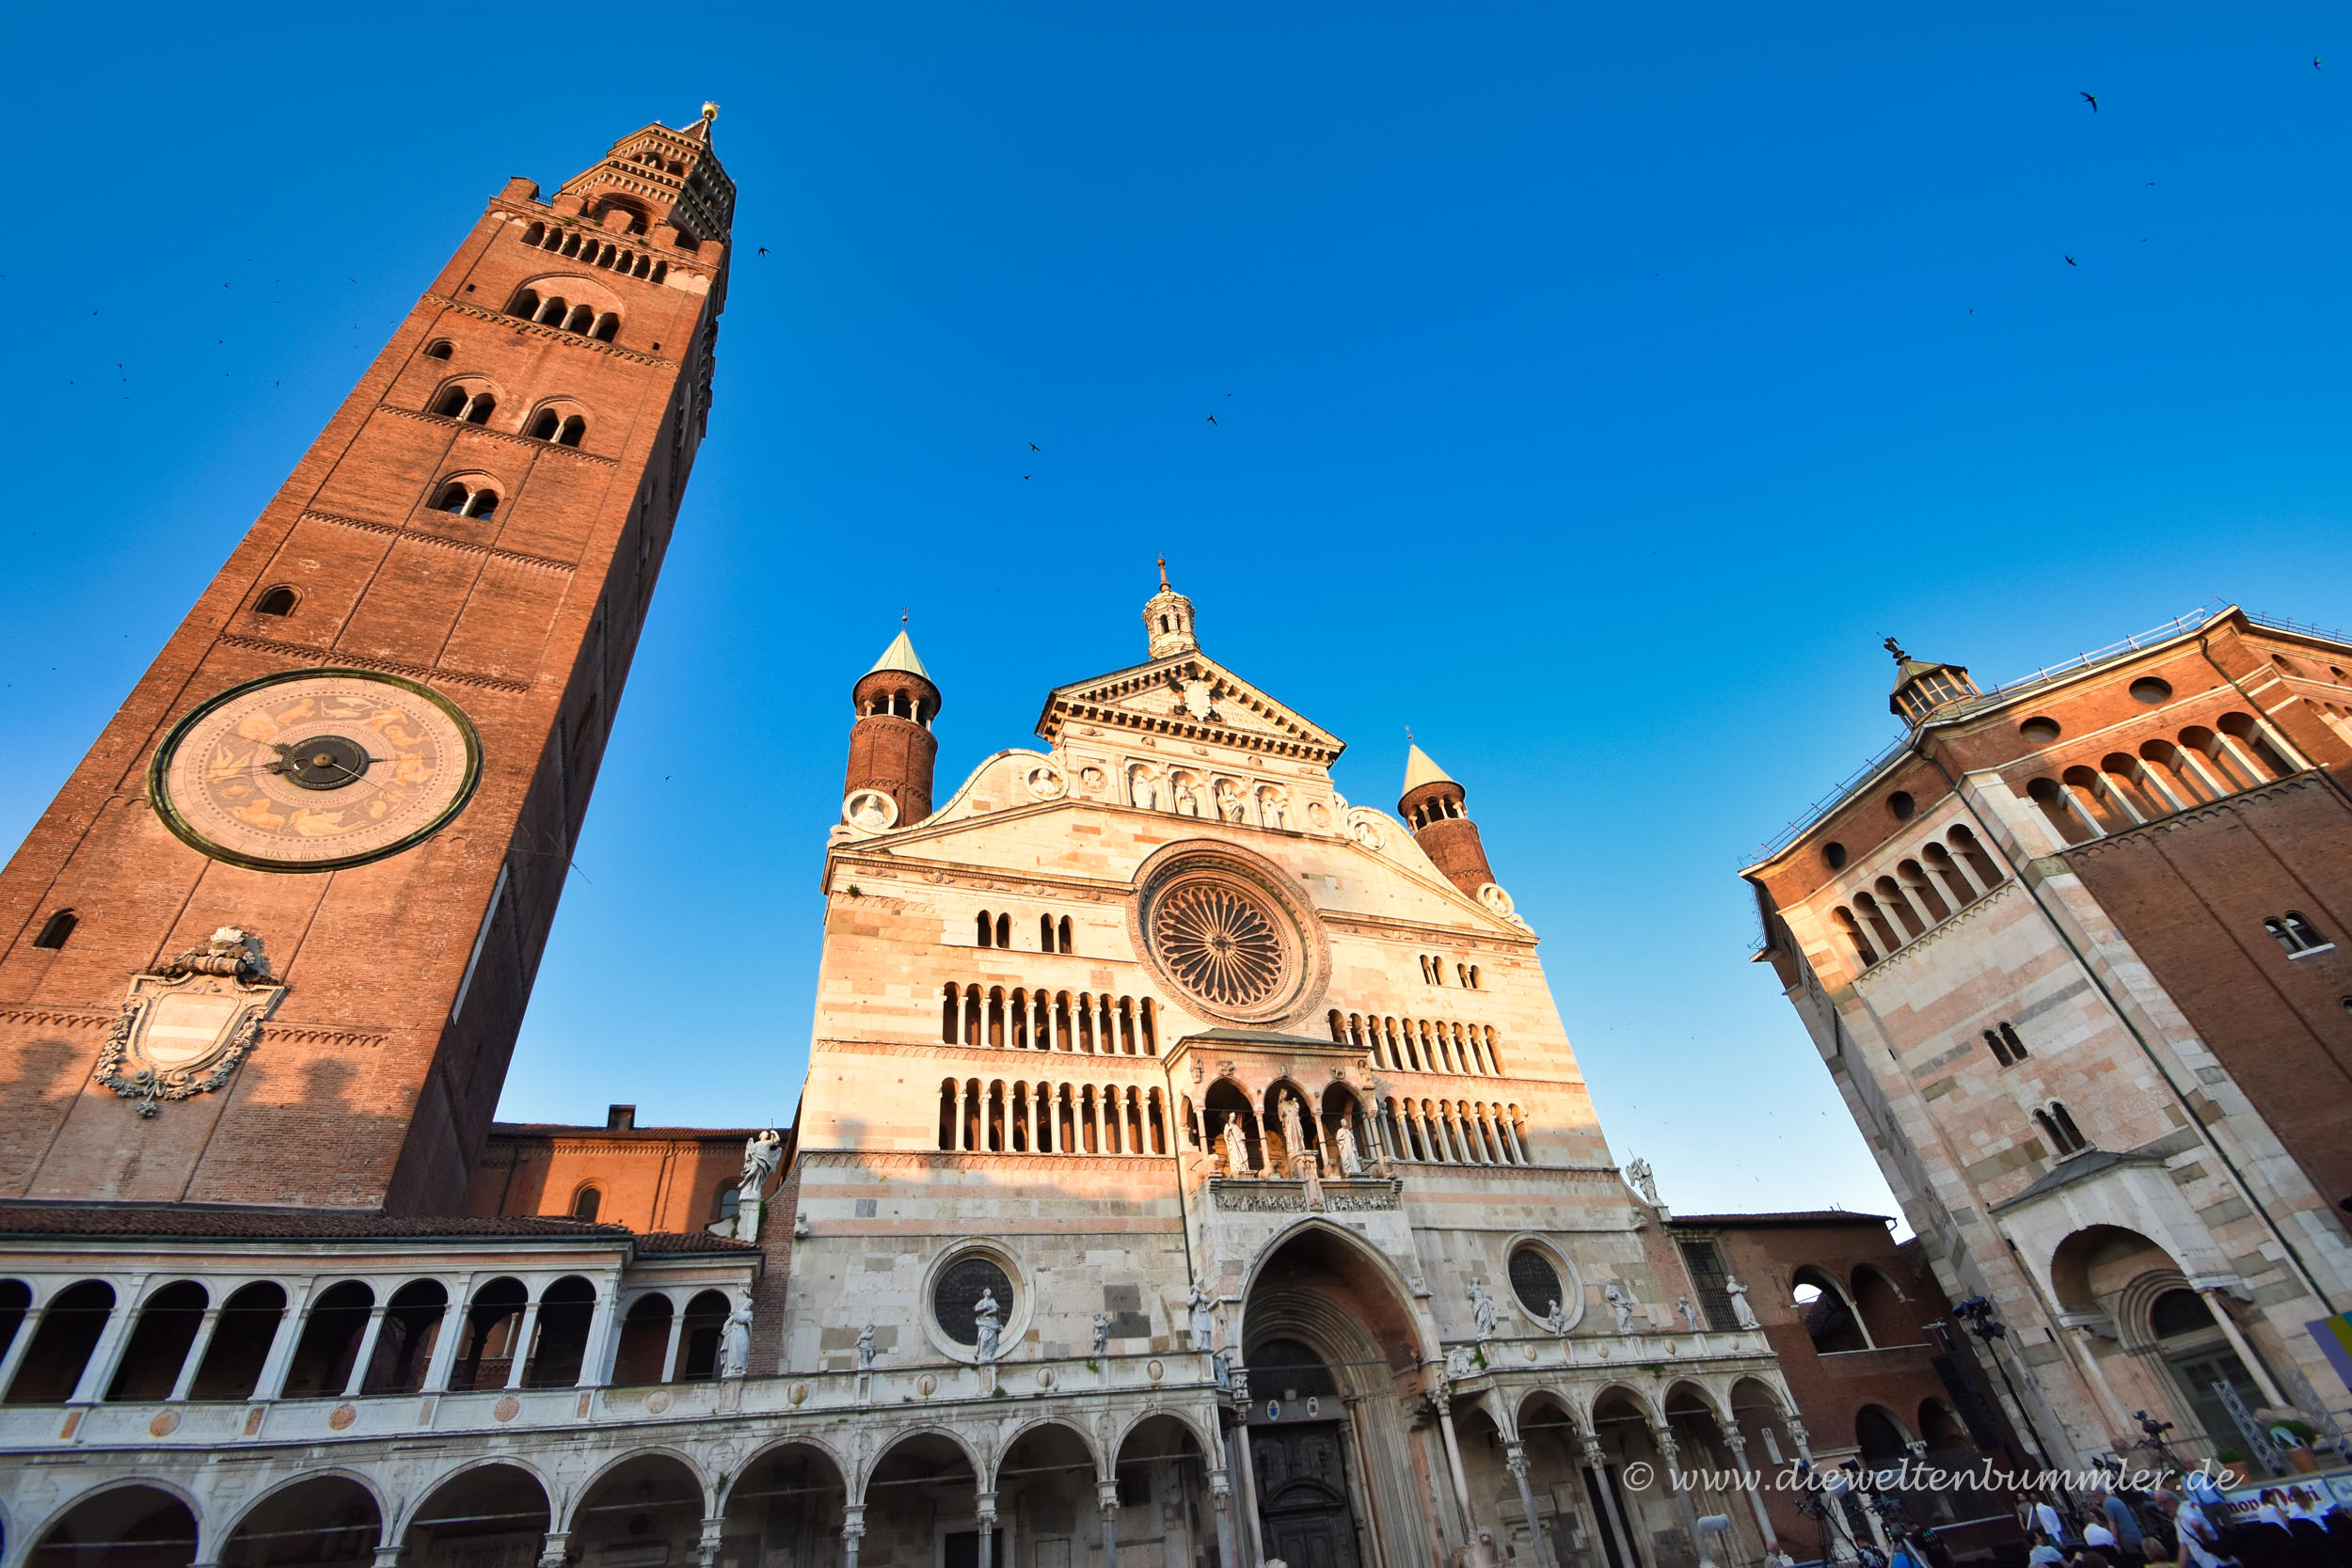 Kathedrale mit Turm und Baptisterium